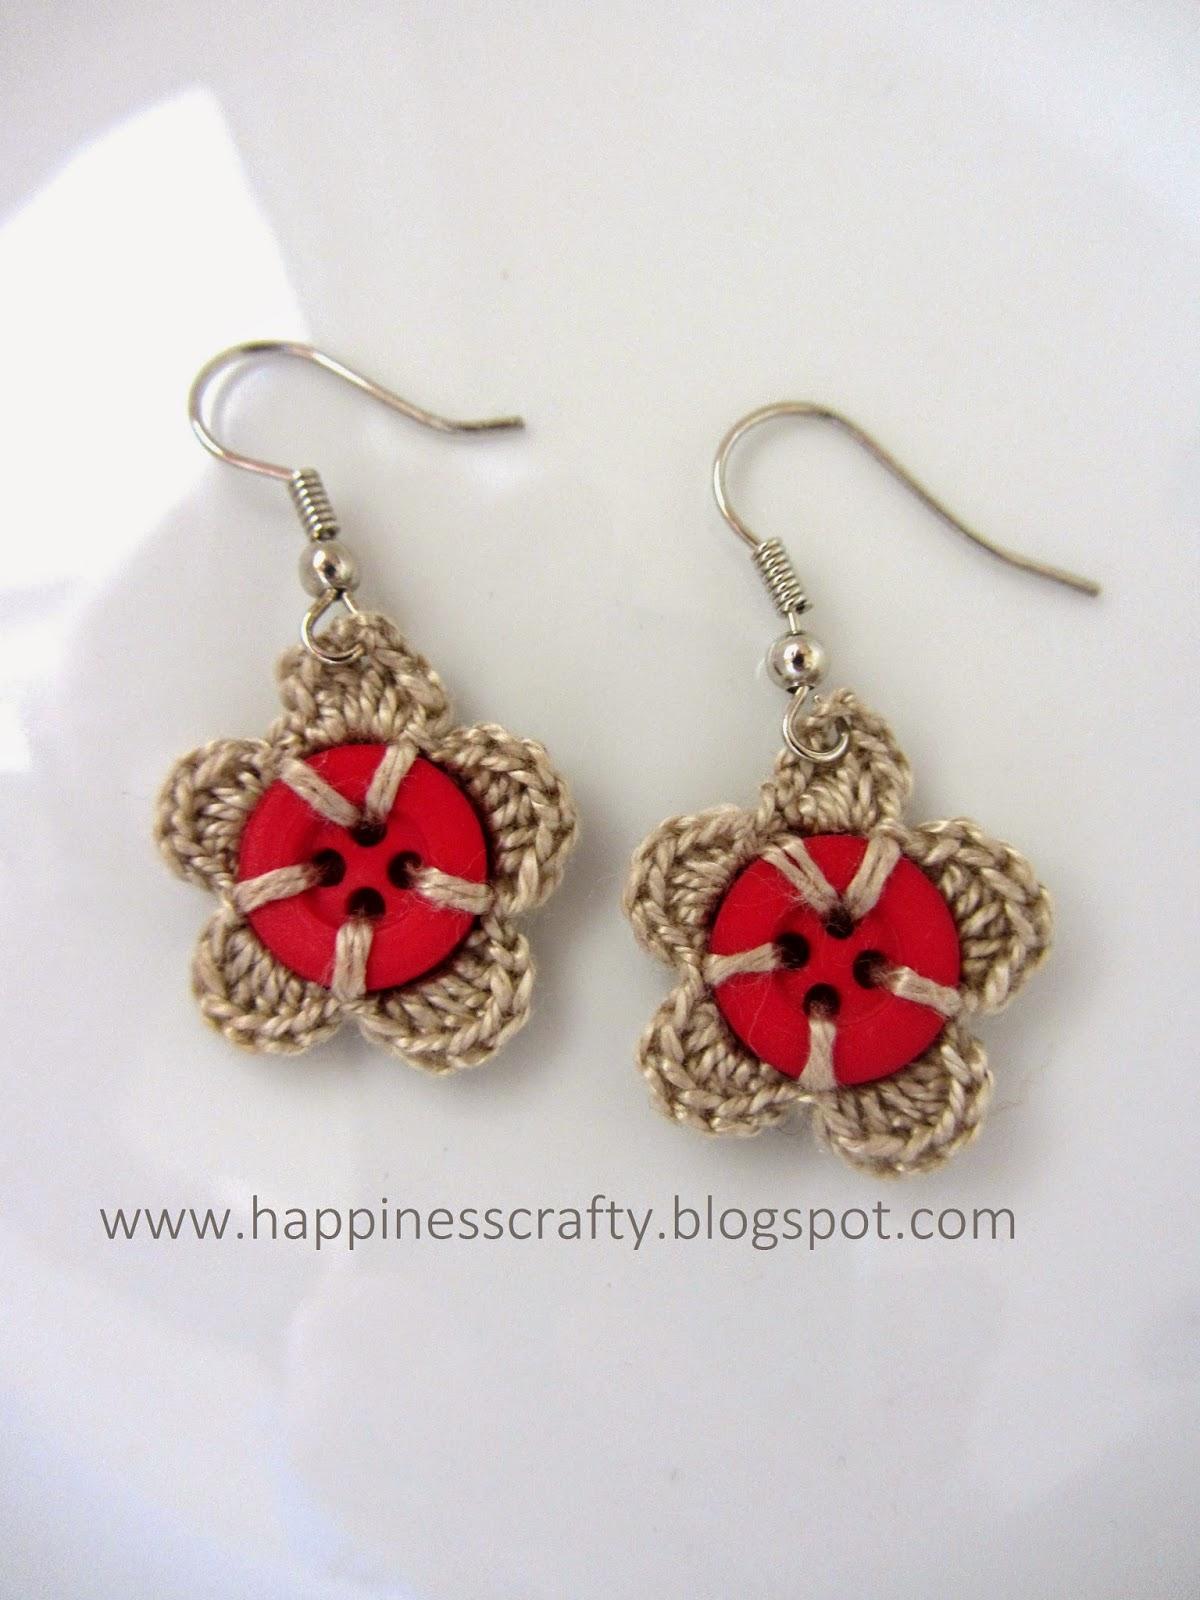 201463 Crochet Flower And Button Earrings Uk Crochet Patterns